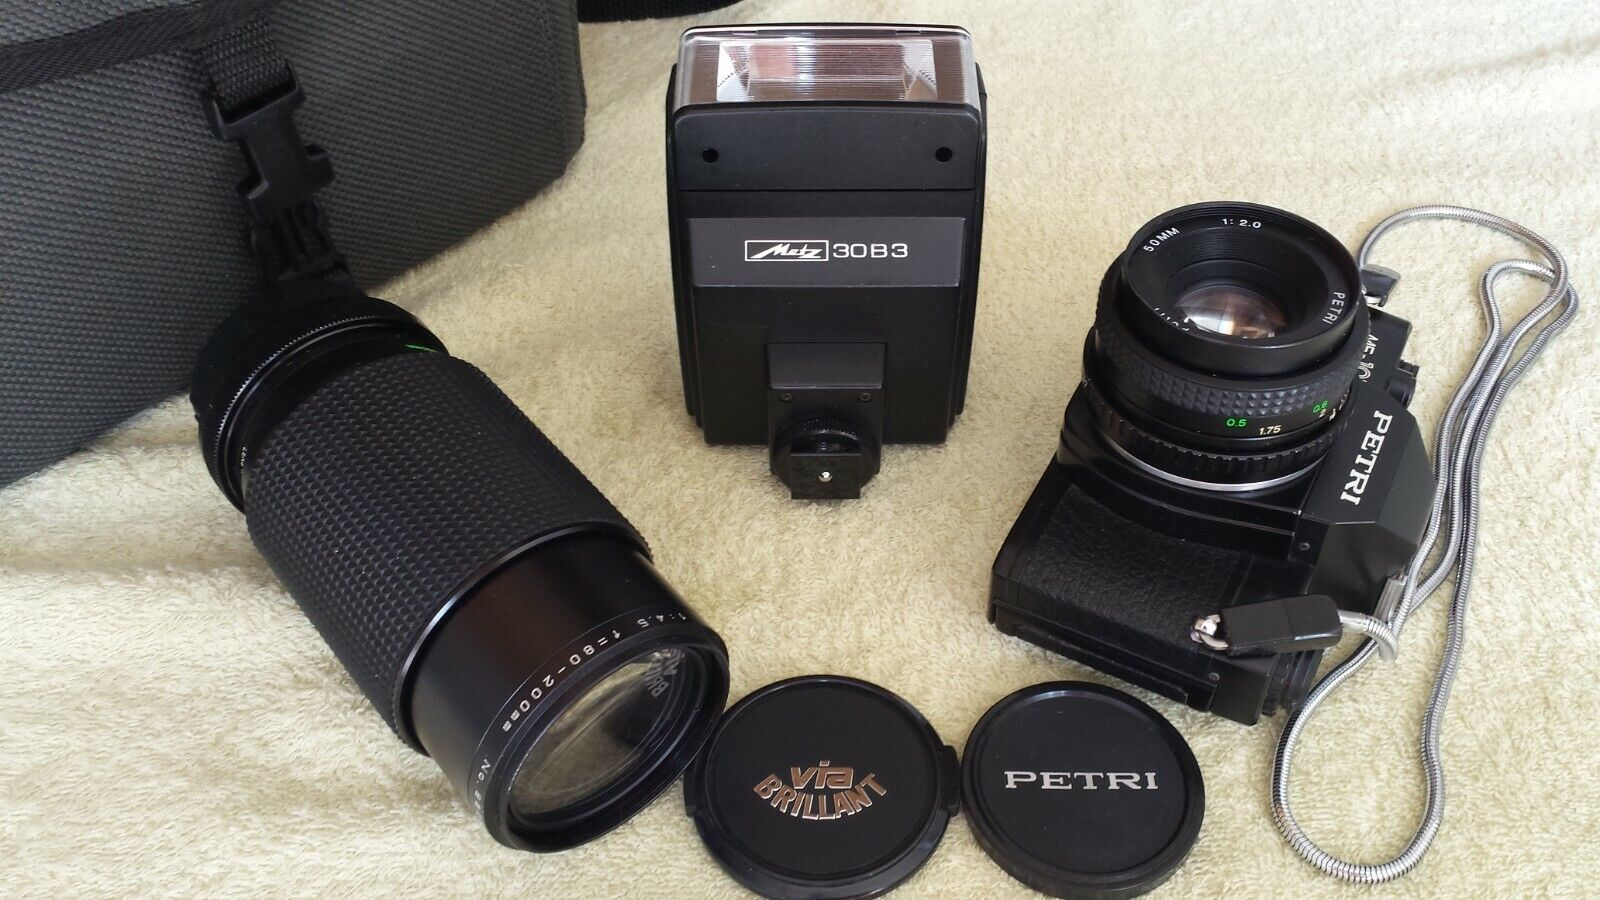 Petri MF-101 Spiegelreflex Kleinbild Kamera, analog, mit Zoom-Objektiv, Blitz